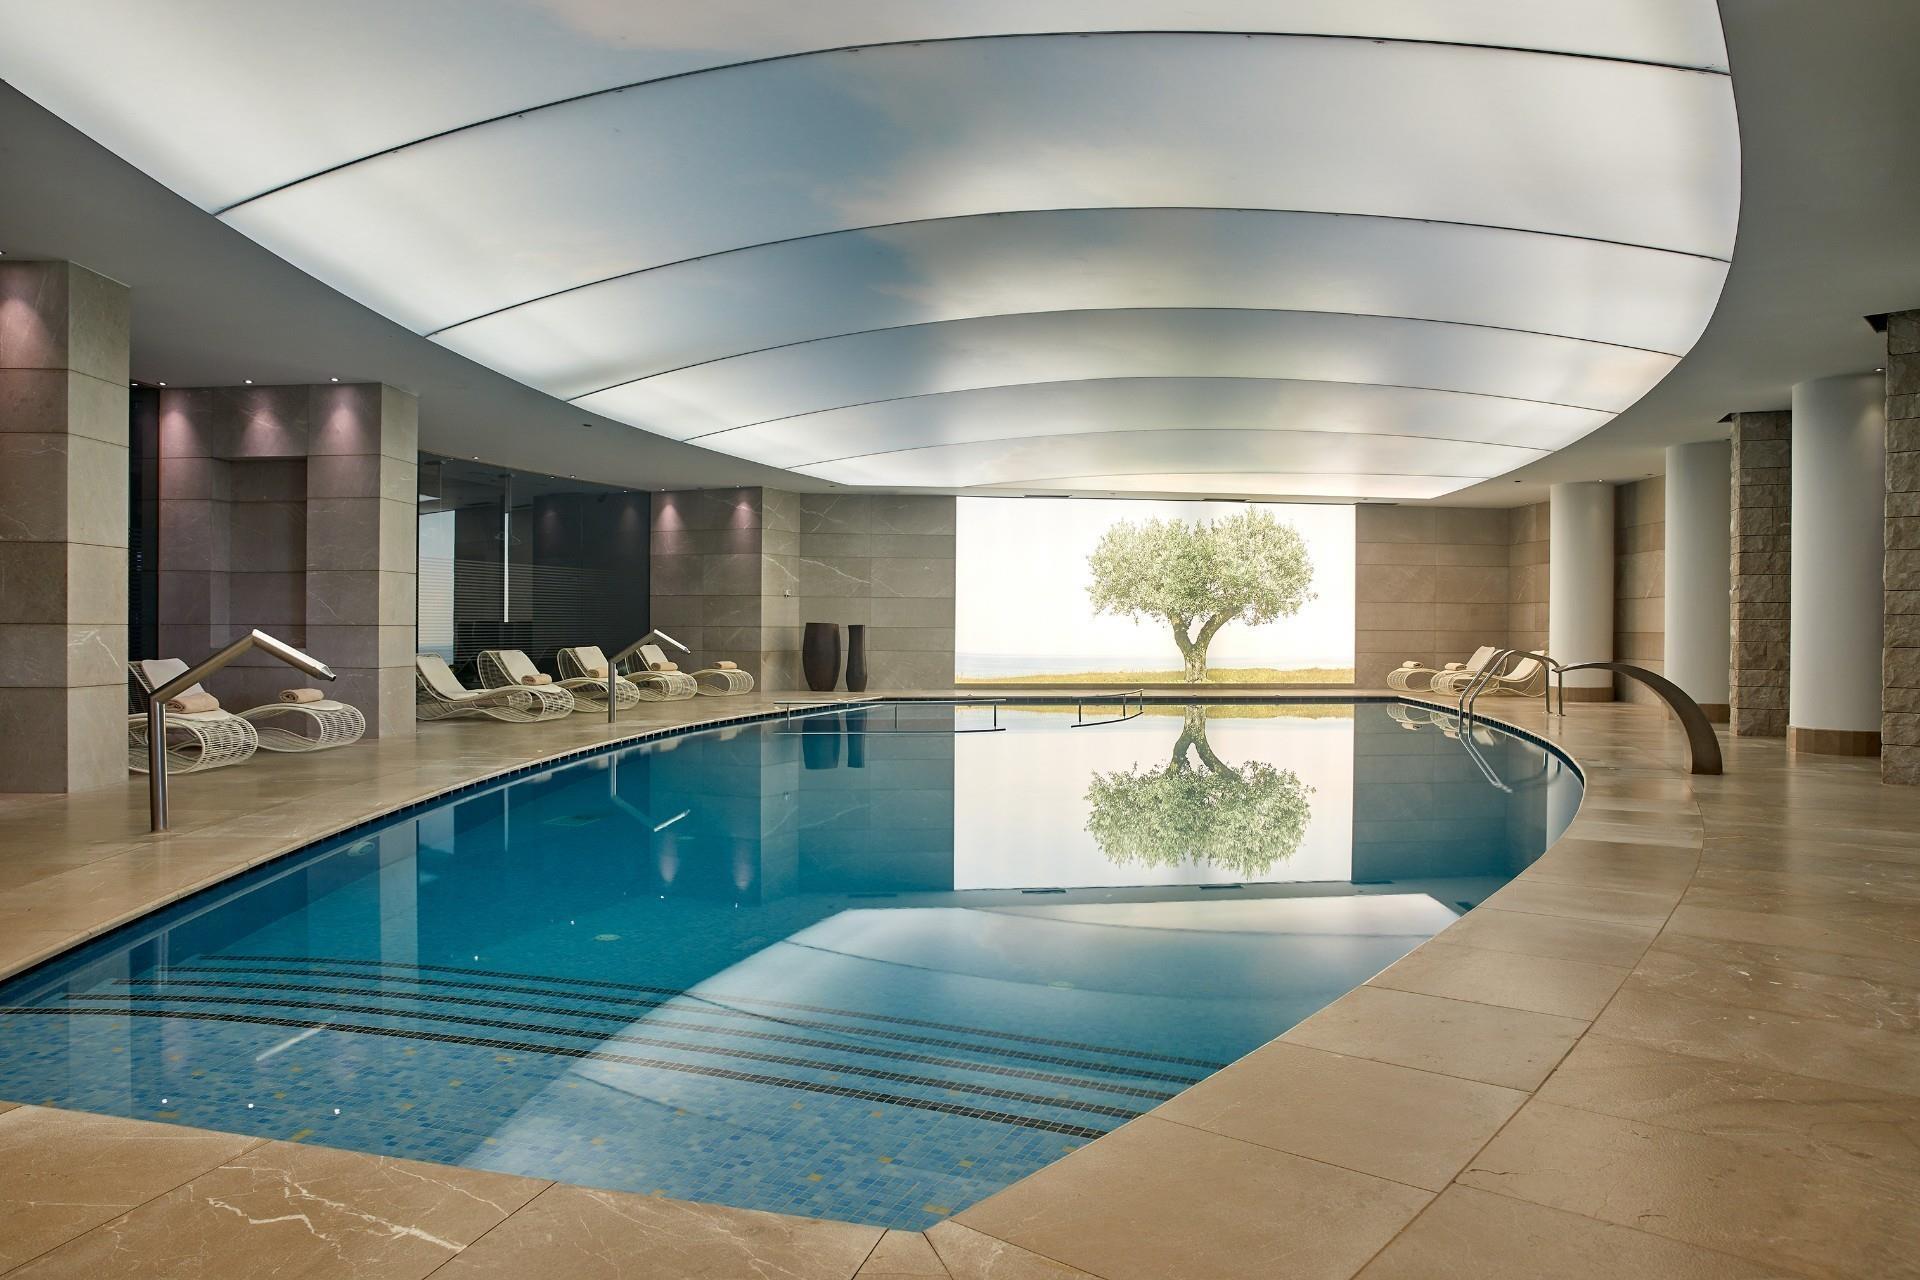 cavo-olympo-luxury-hotel-spa-genel-0020